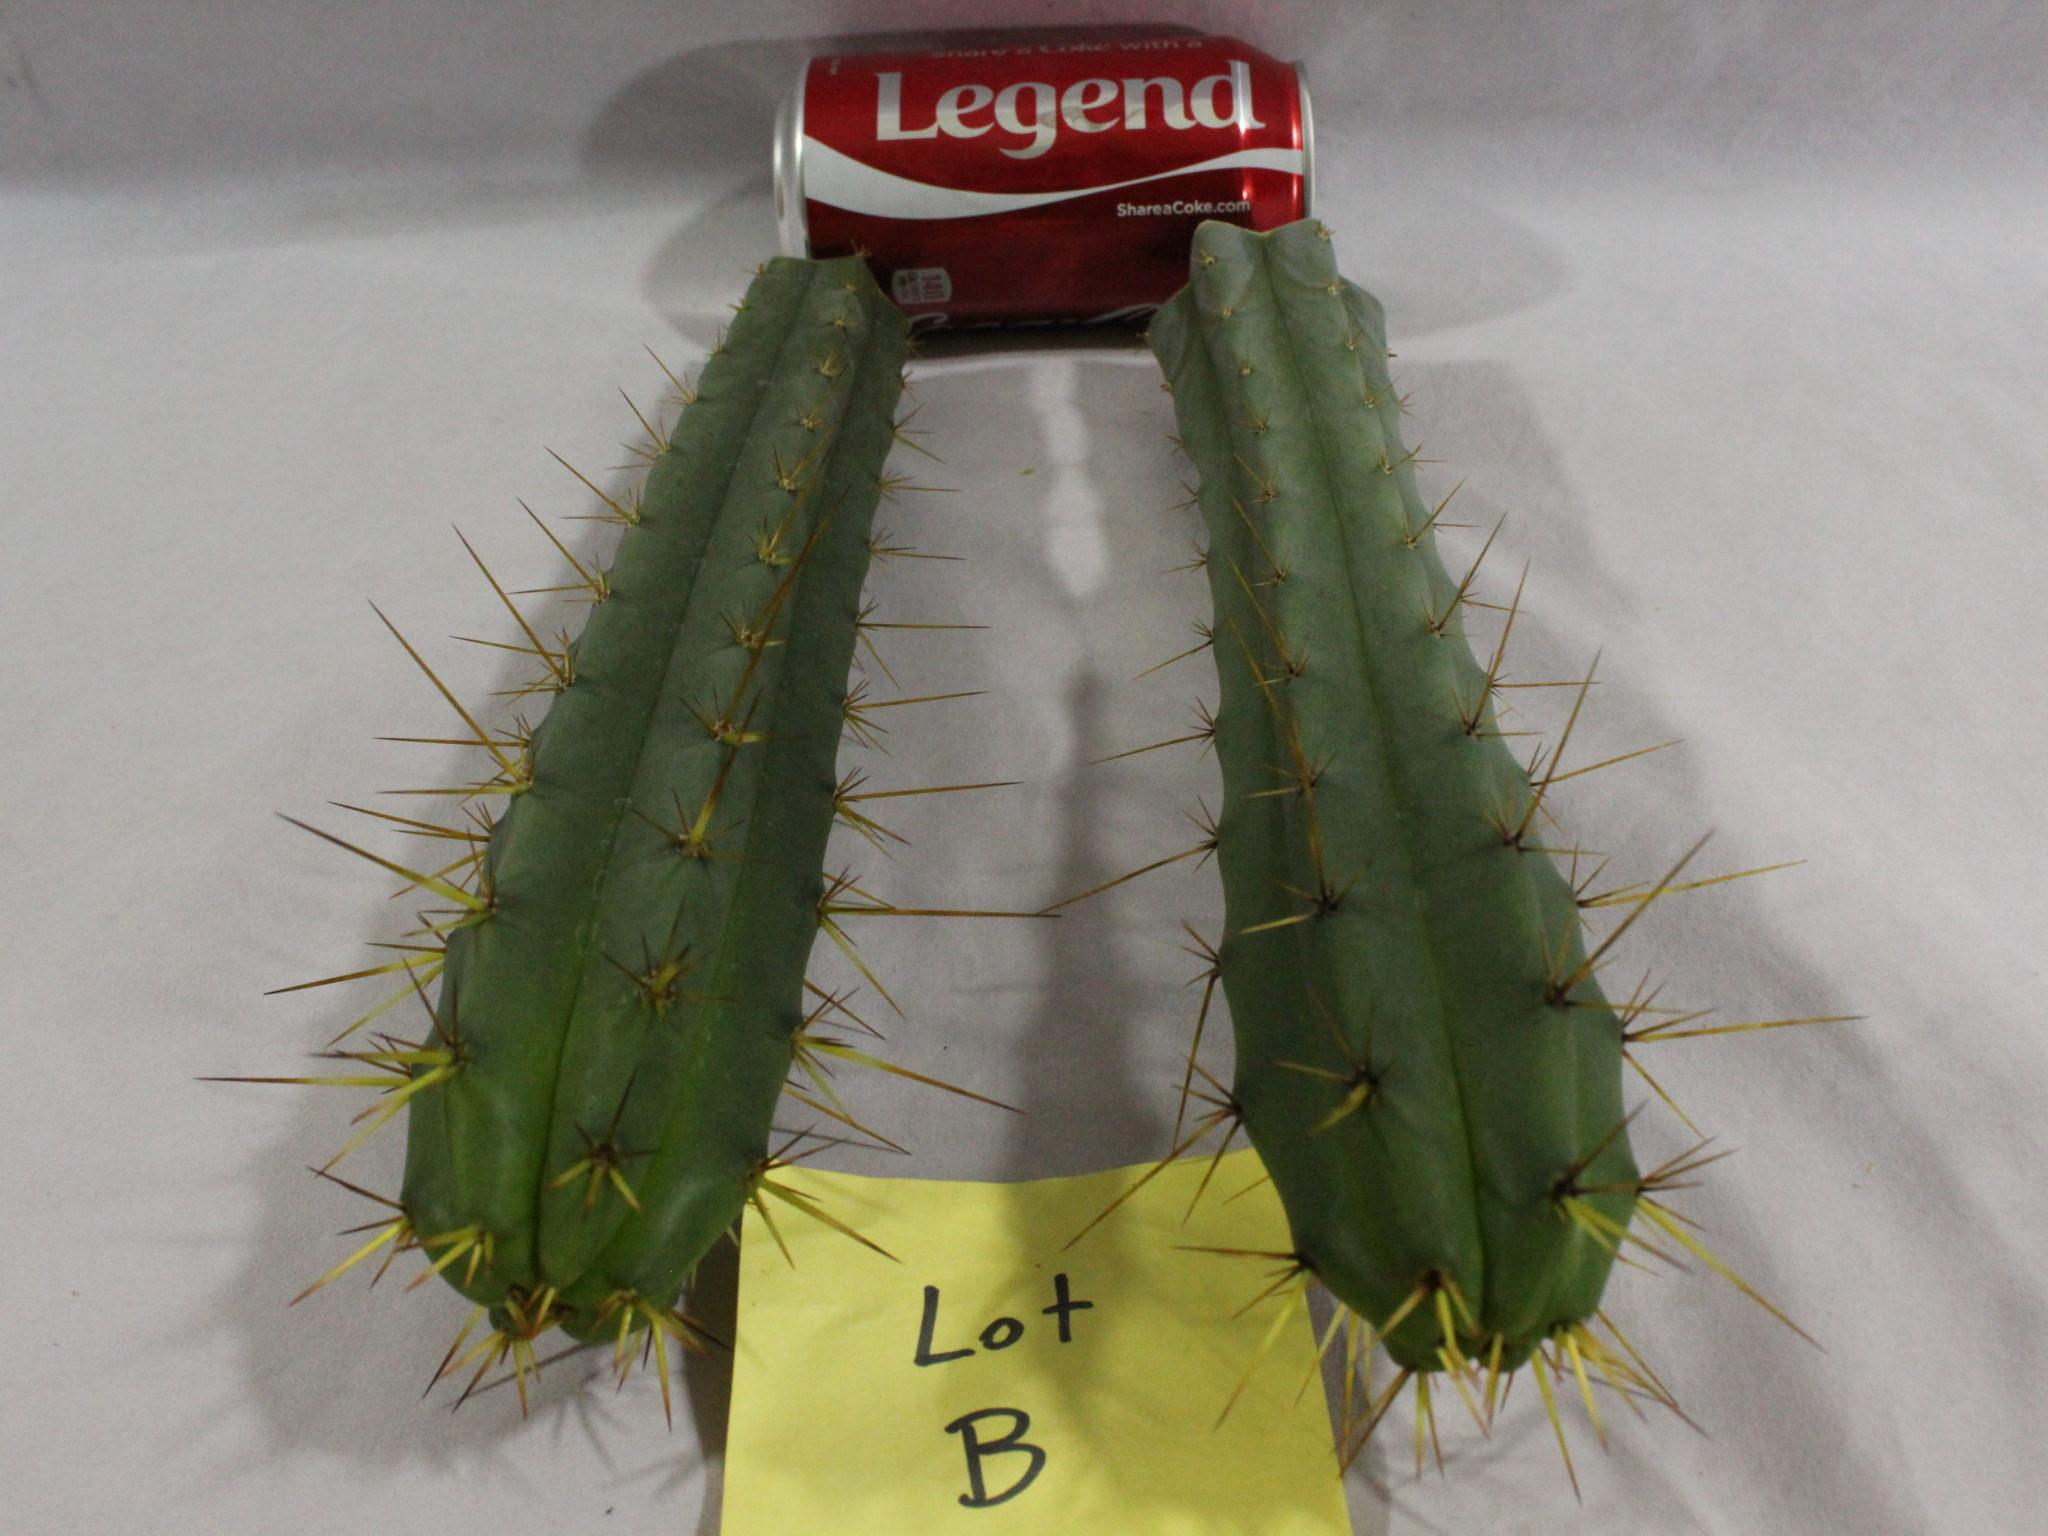 Buy Bridgesii cacti here